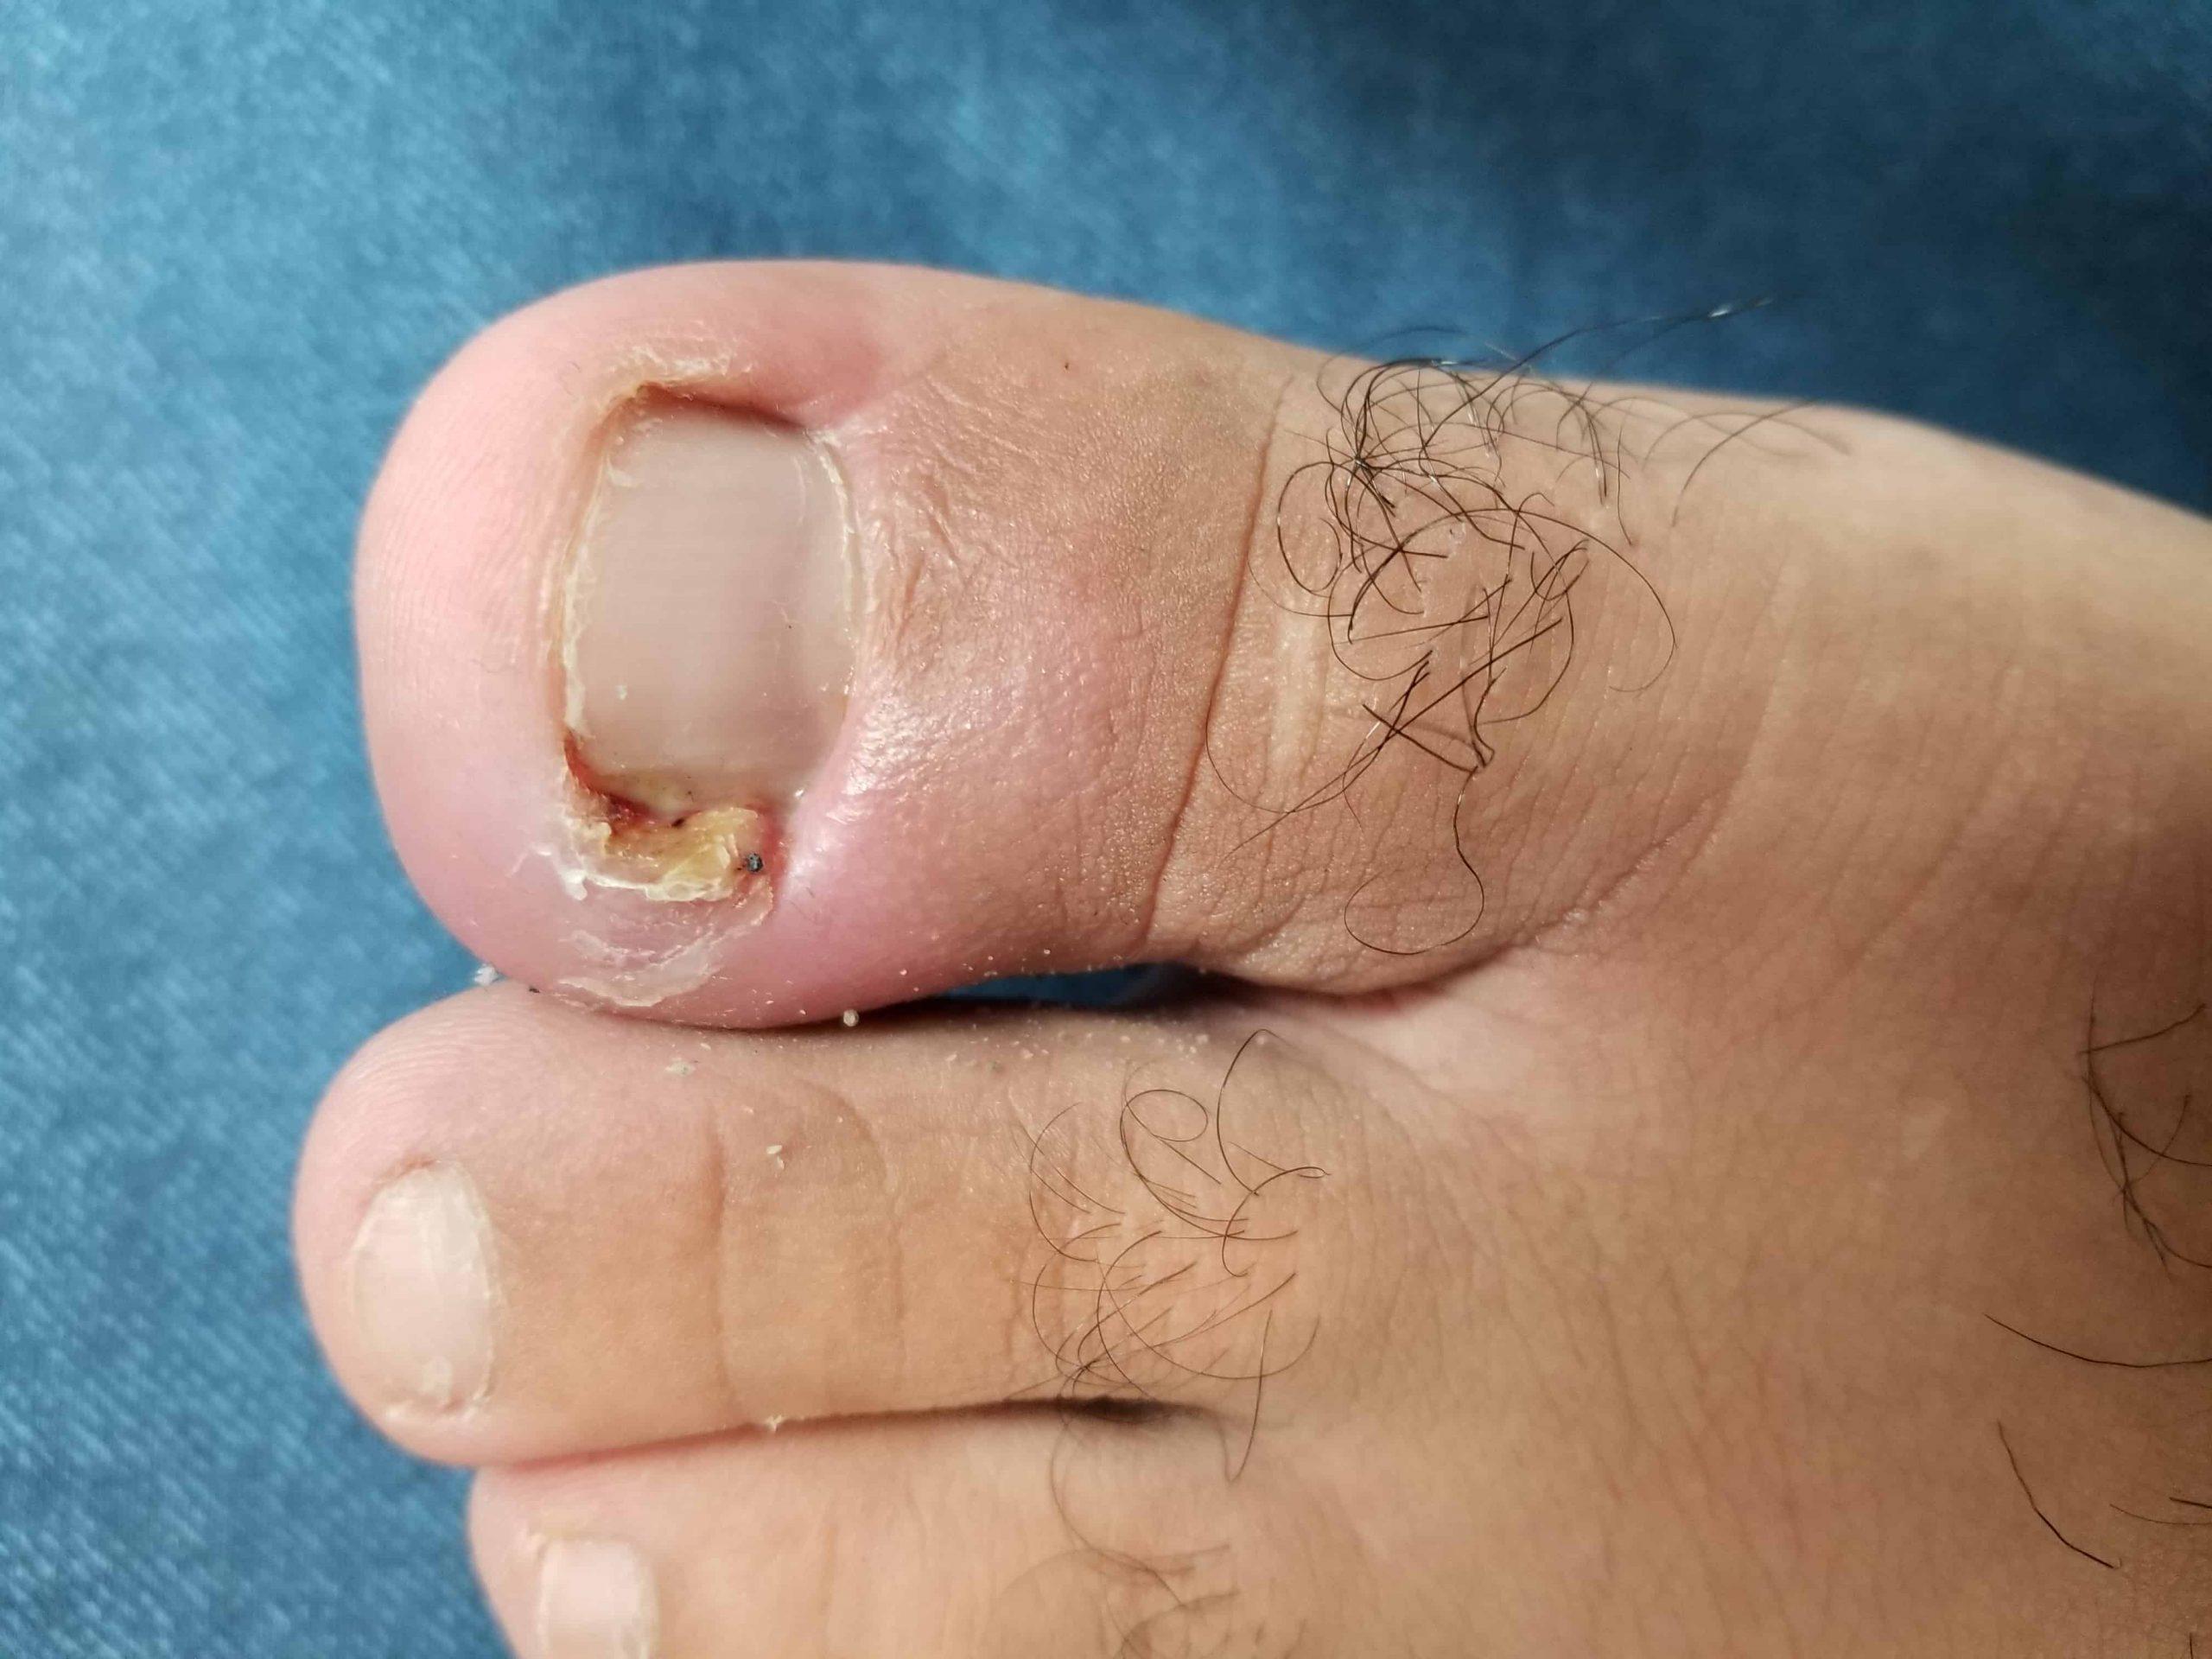 Upper James Foot Clinic Ingrown Toenail Care